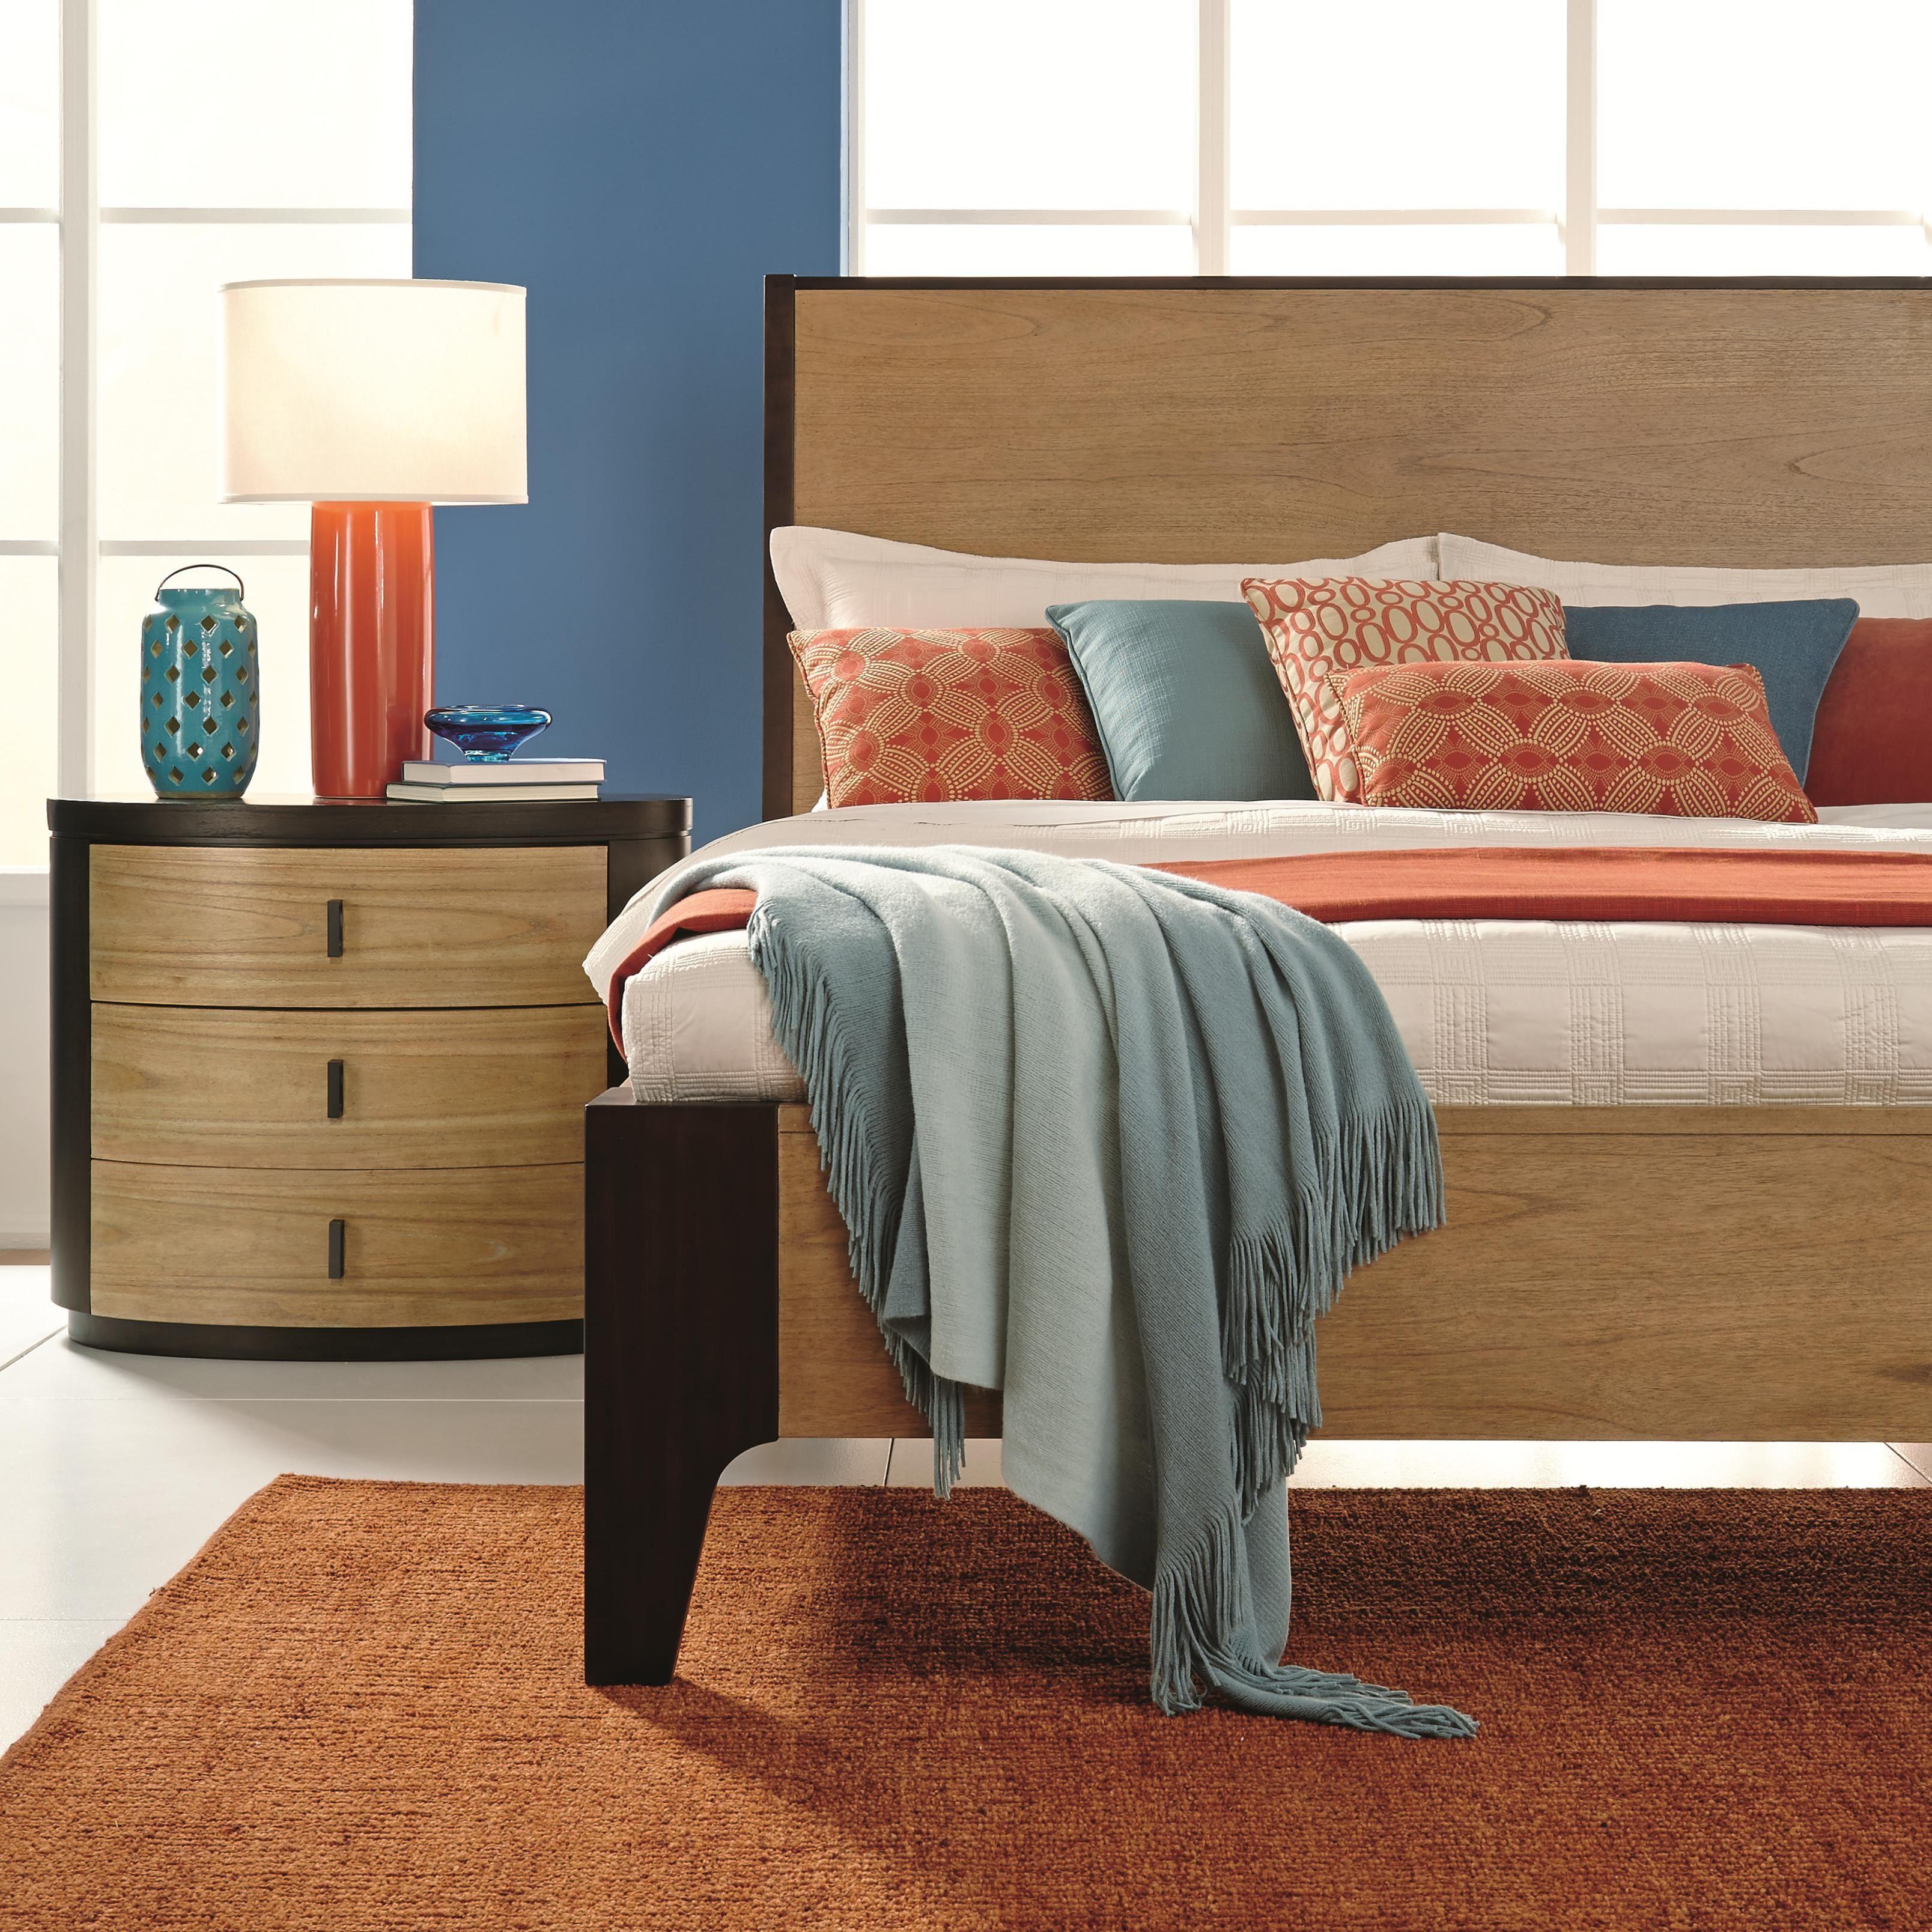 HGTV Home Furniture Collection Voyage Queen Size Panel Bed | Baeru0027s  Furniture | Headboard U0026 Footboard